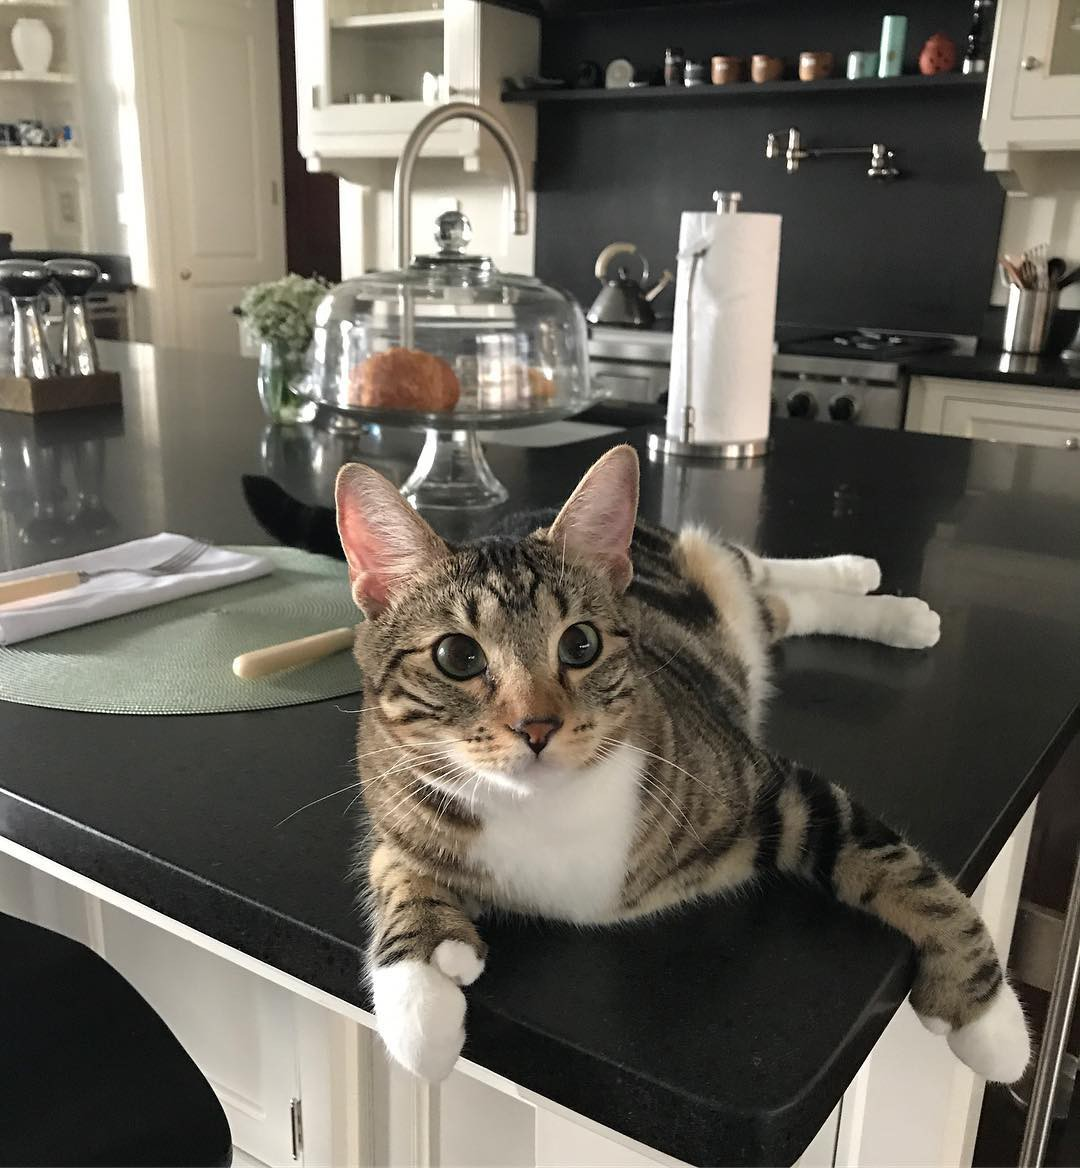 Jerry Seinfeld's cat